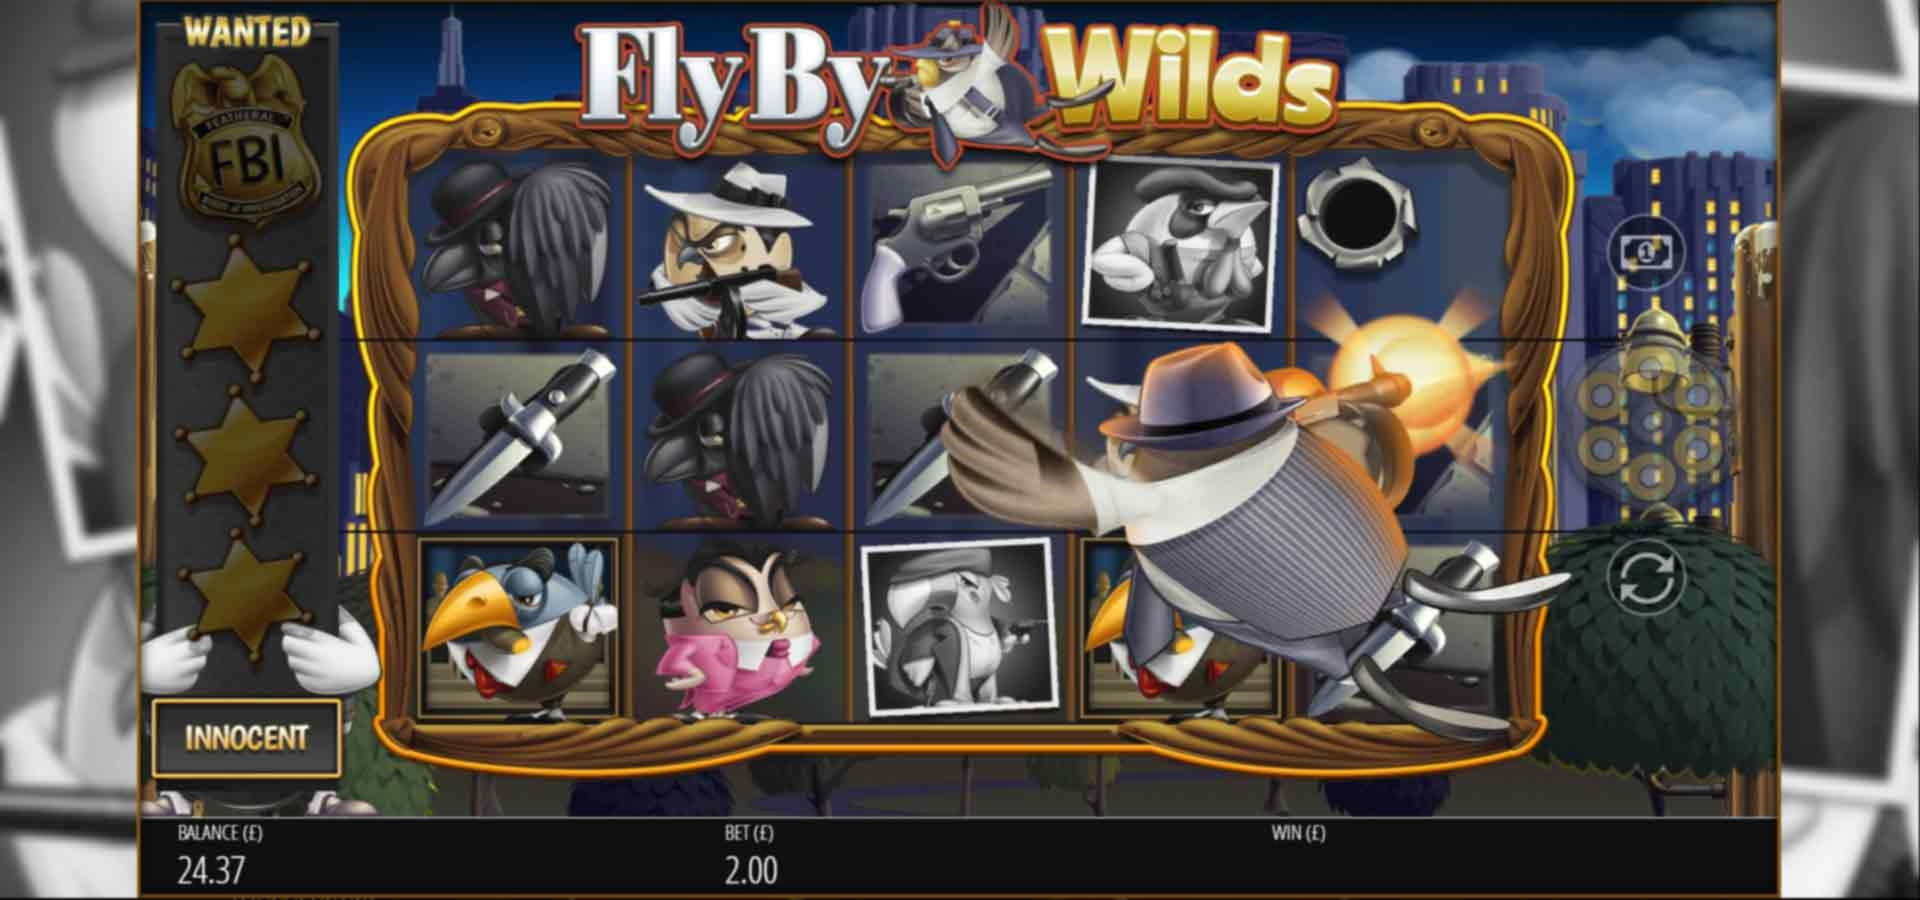 105 Free casino spins at Fruity Casa